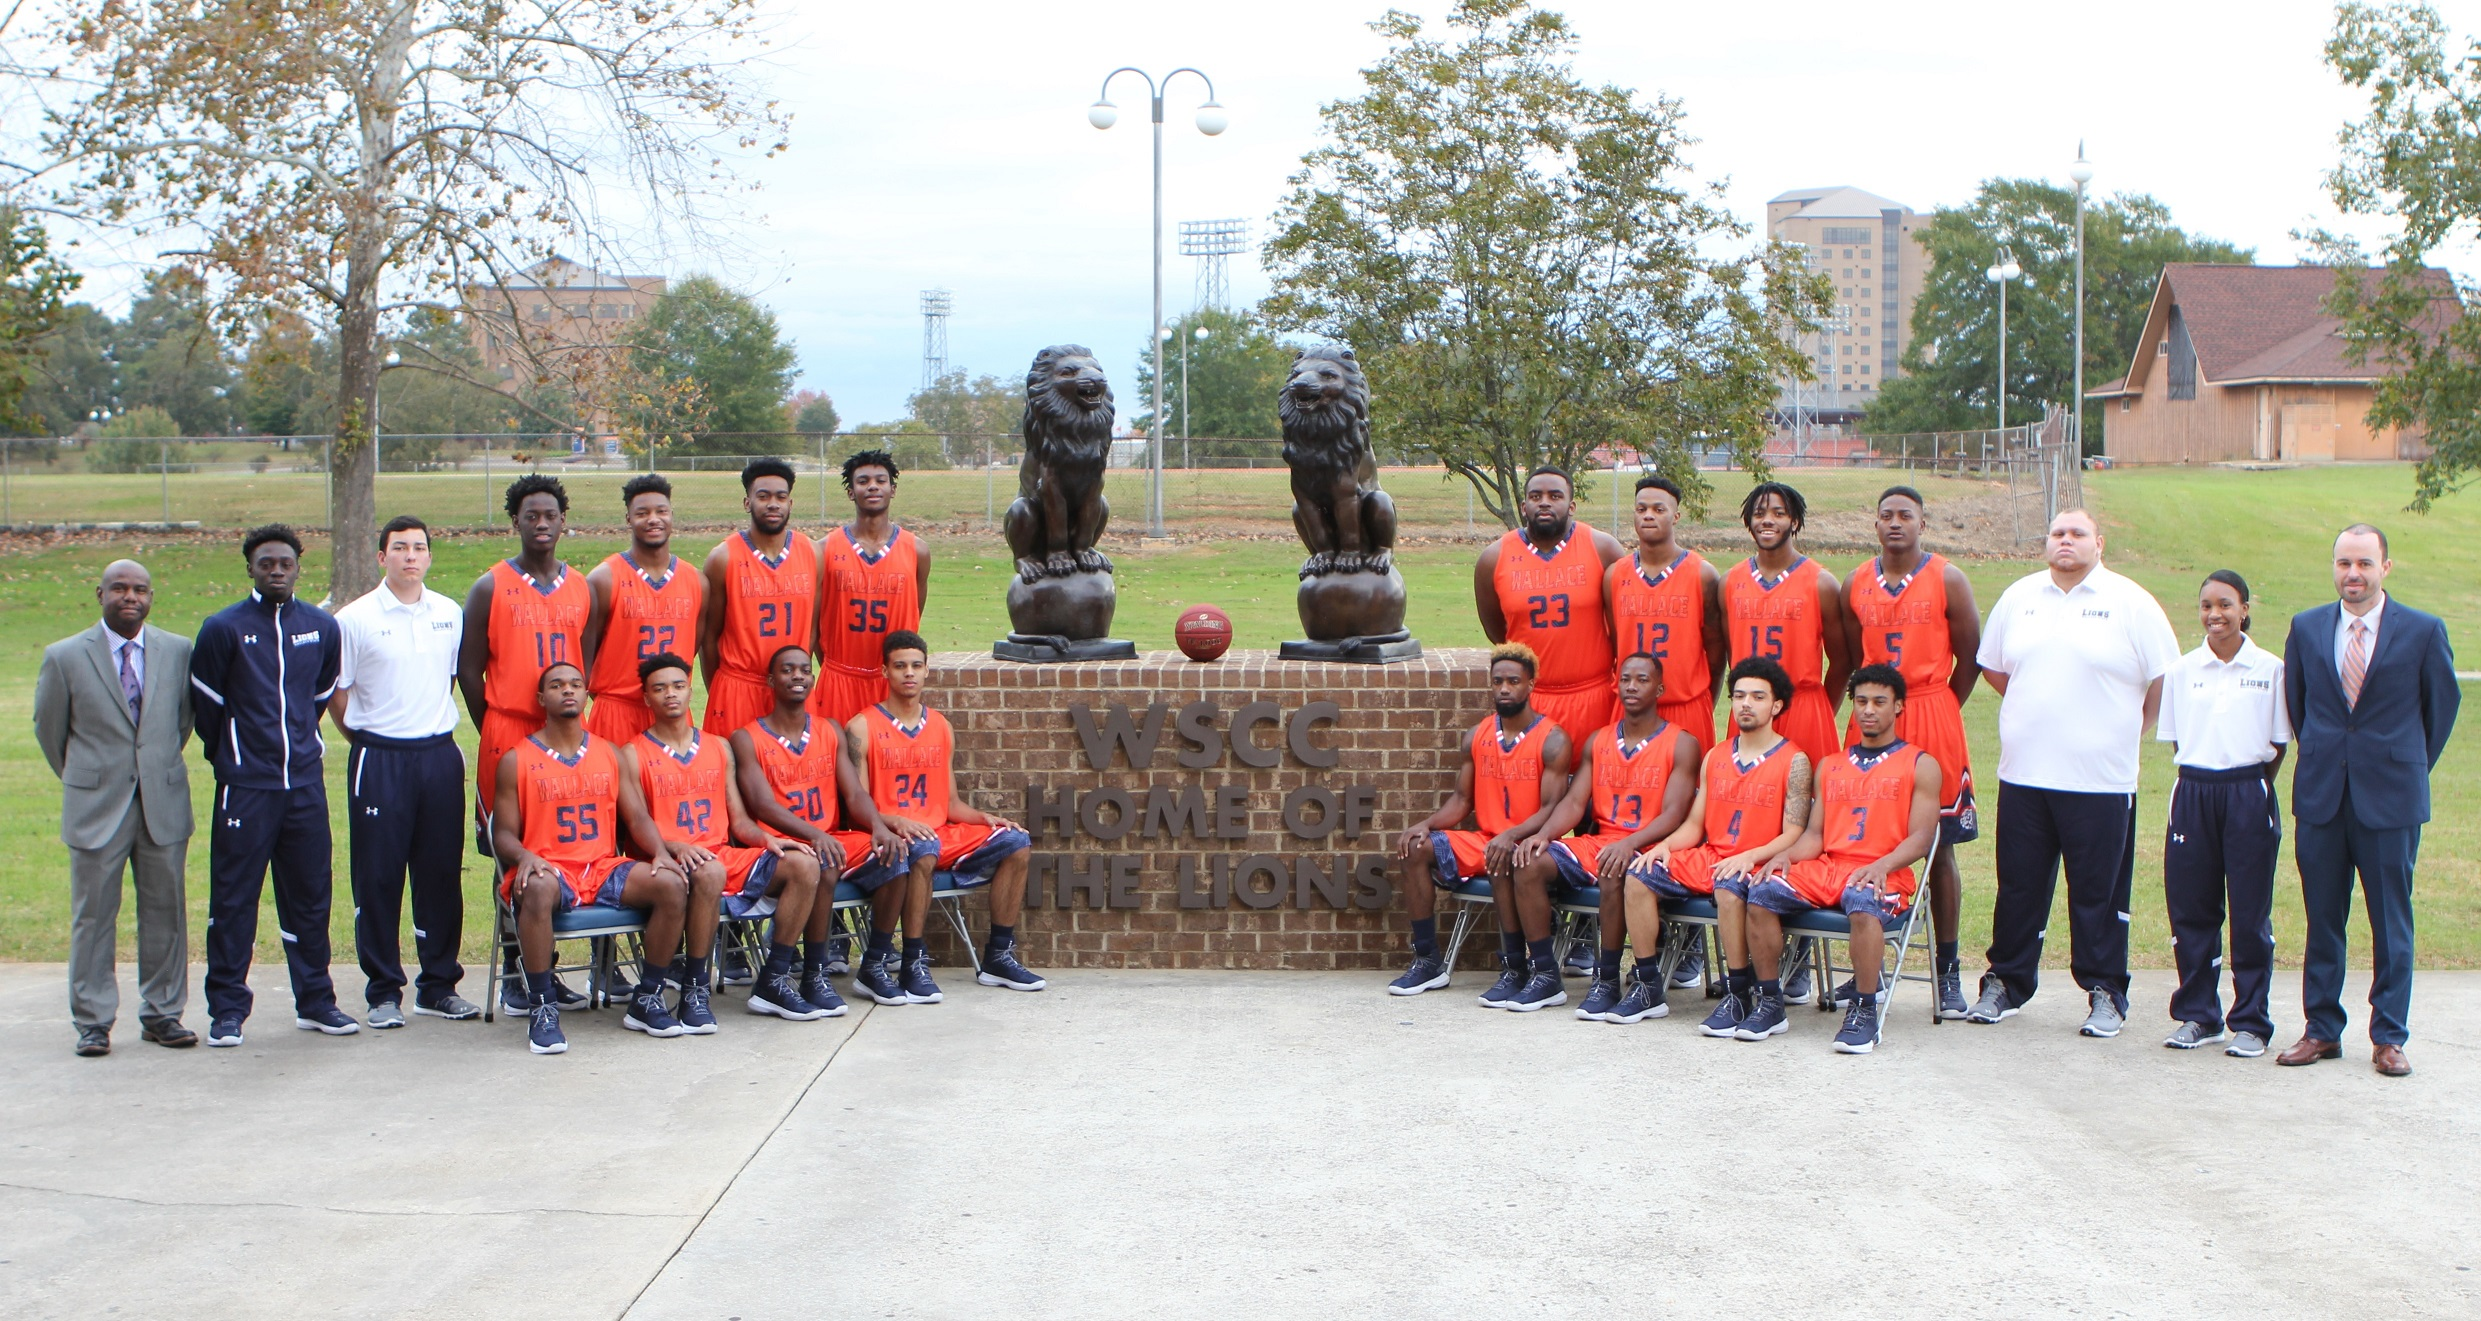 2017-2018-wallace-state-mens-basketball-team-web.jpg